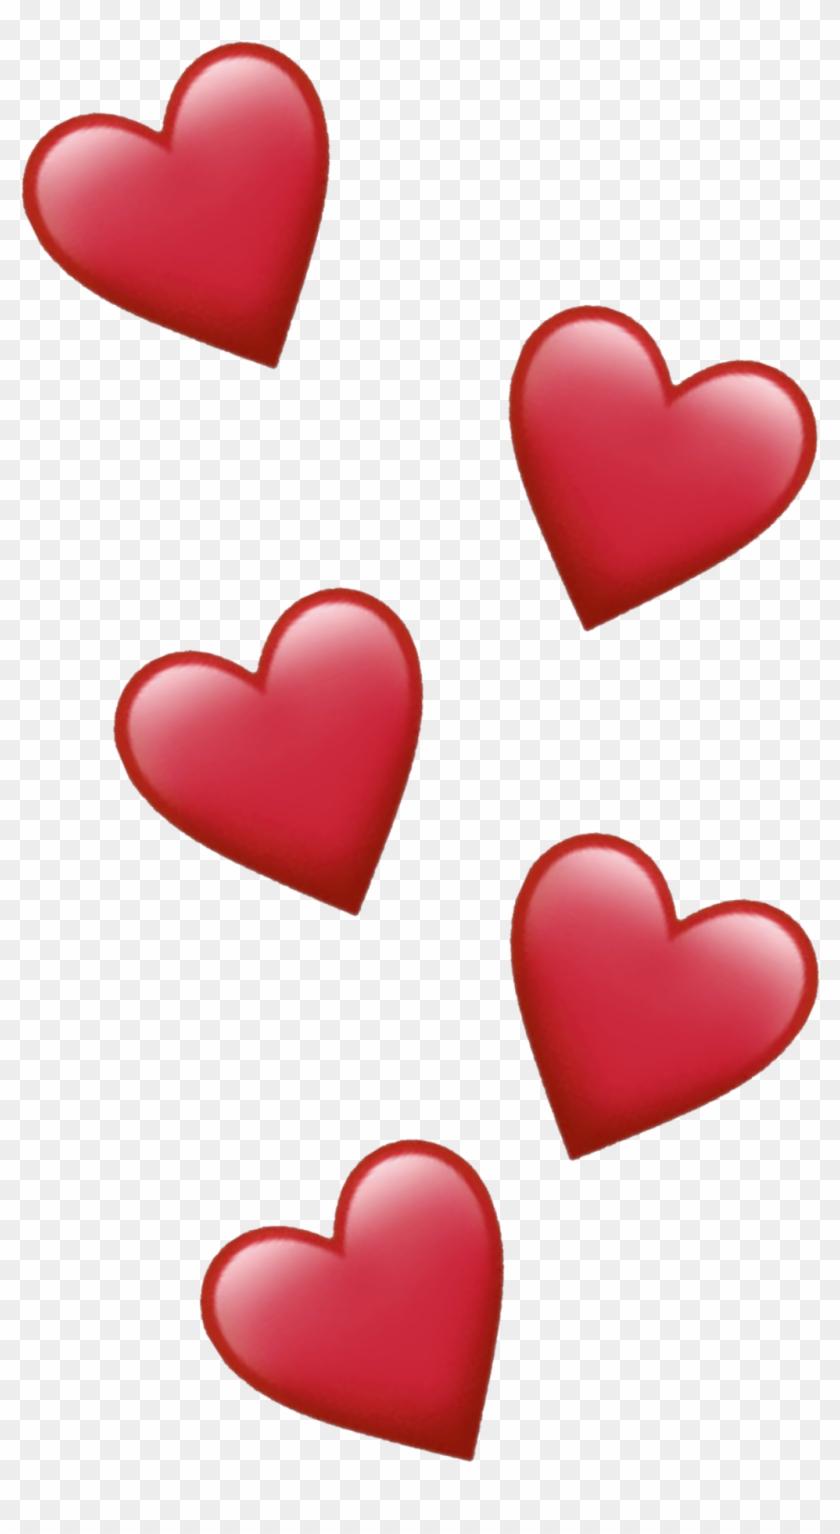 Red Heart Emoji   Heart, HD Png Download   12x1212 ...